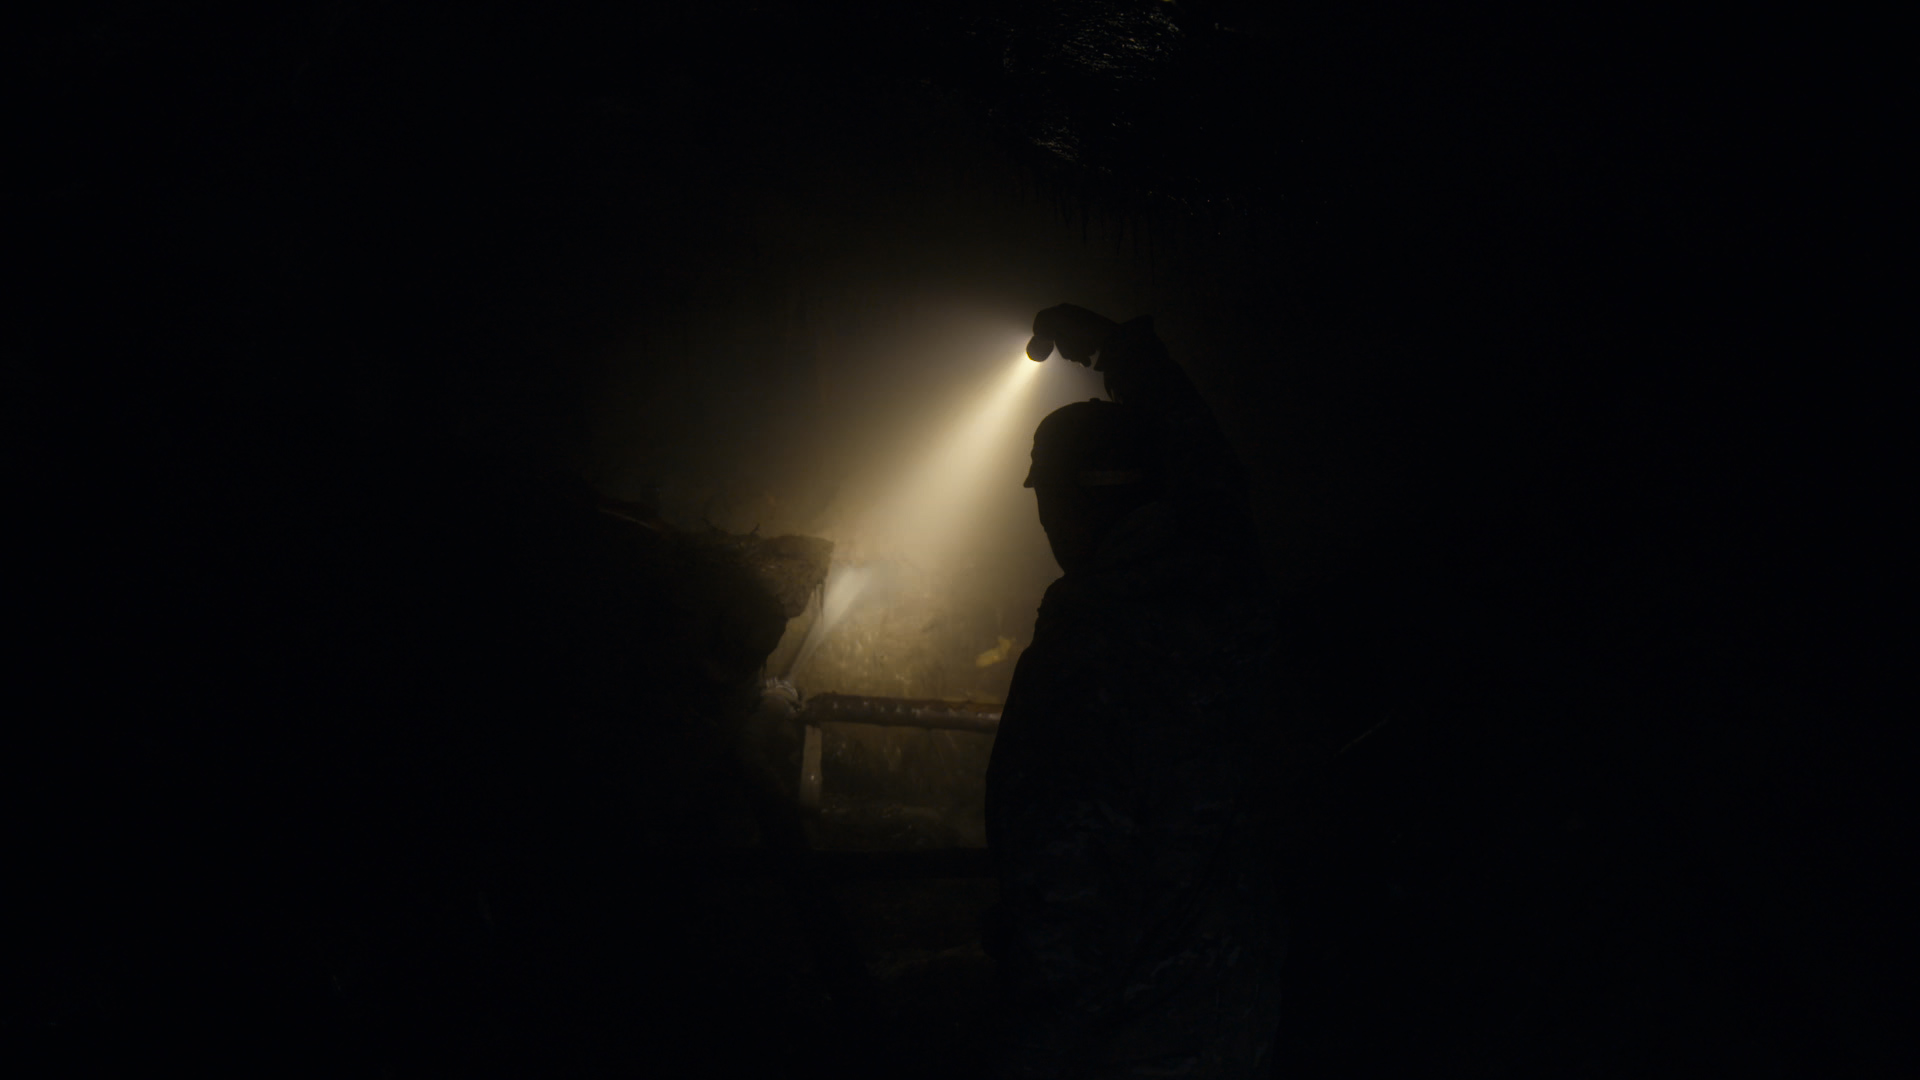 Lelaki menyalakan senter di dalam terowongan